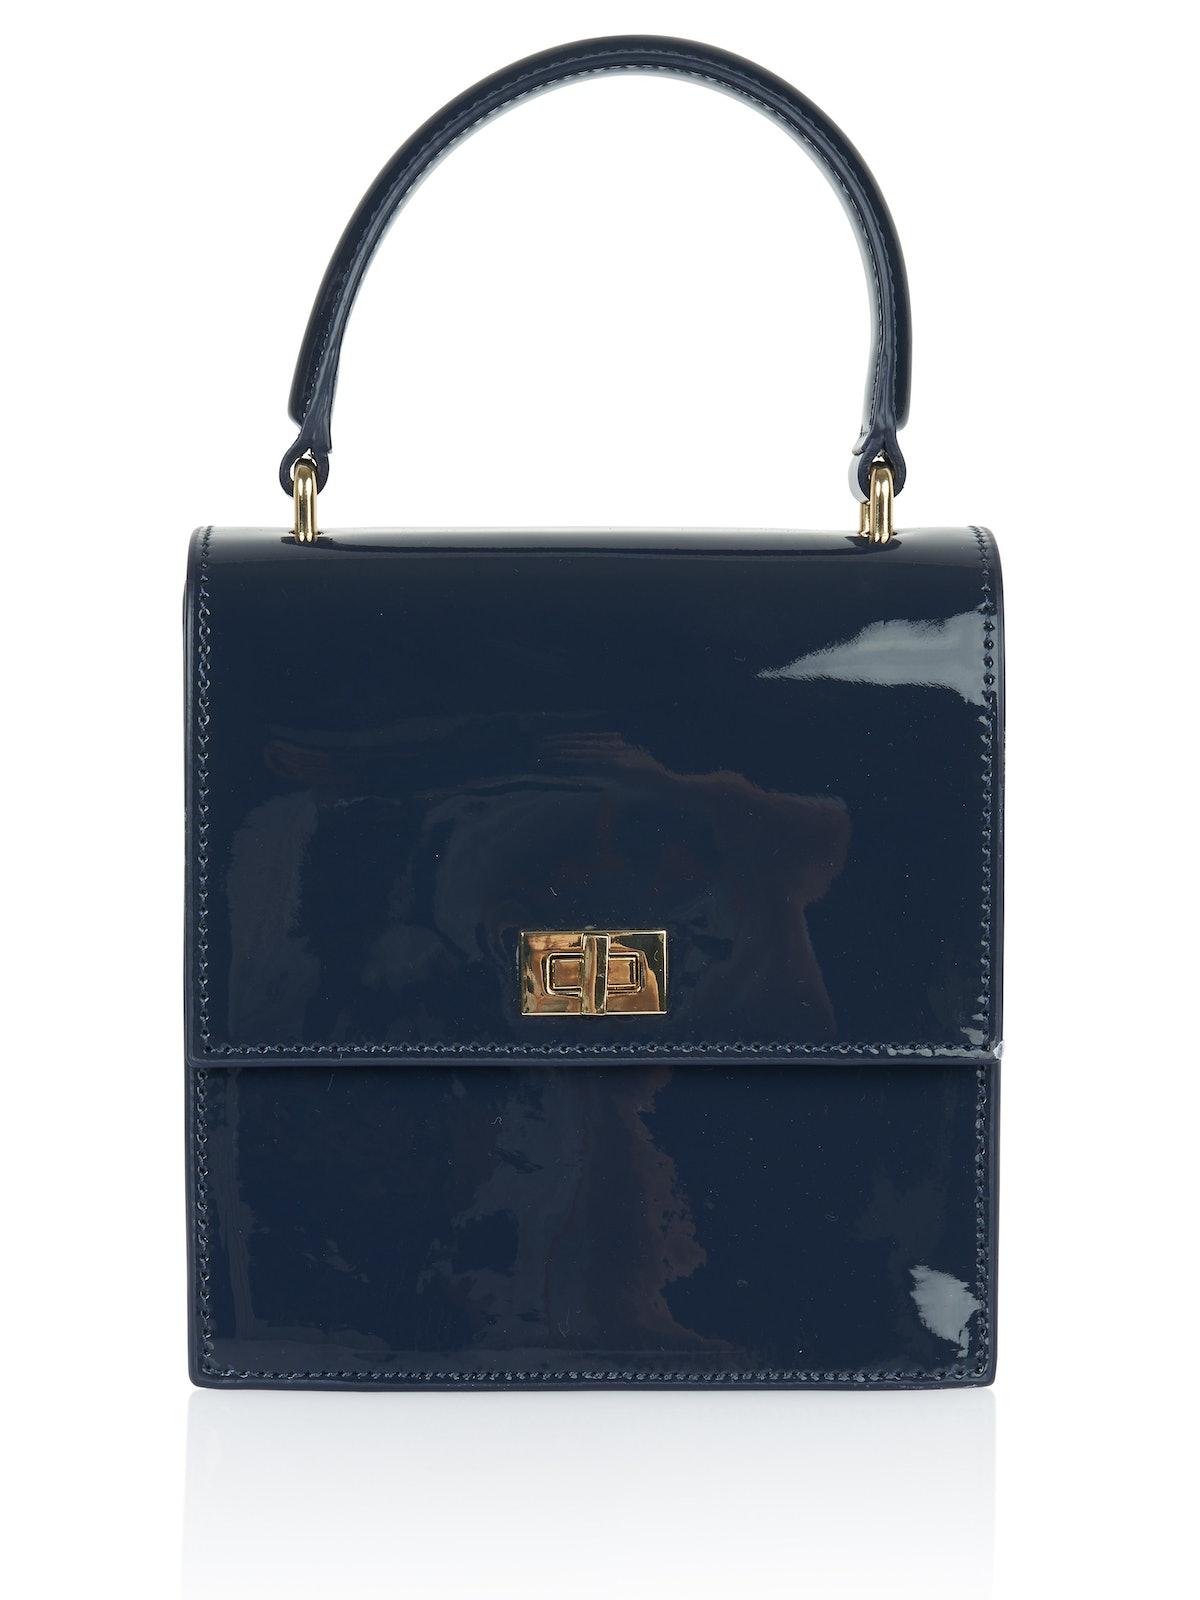 NEELY & CHLOE Mini Lady Navy Bag